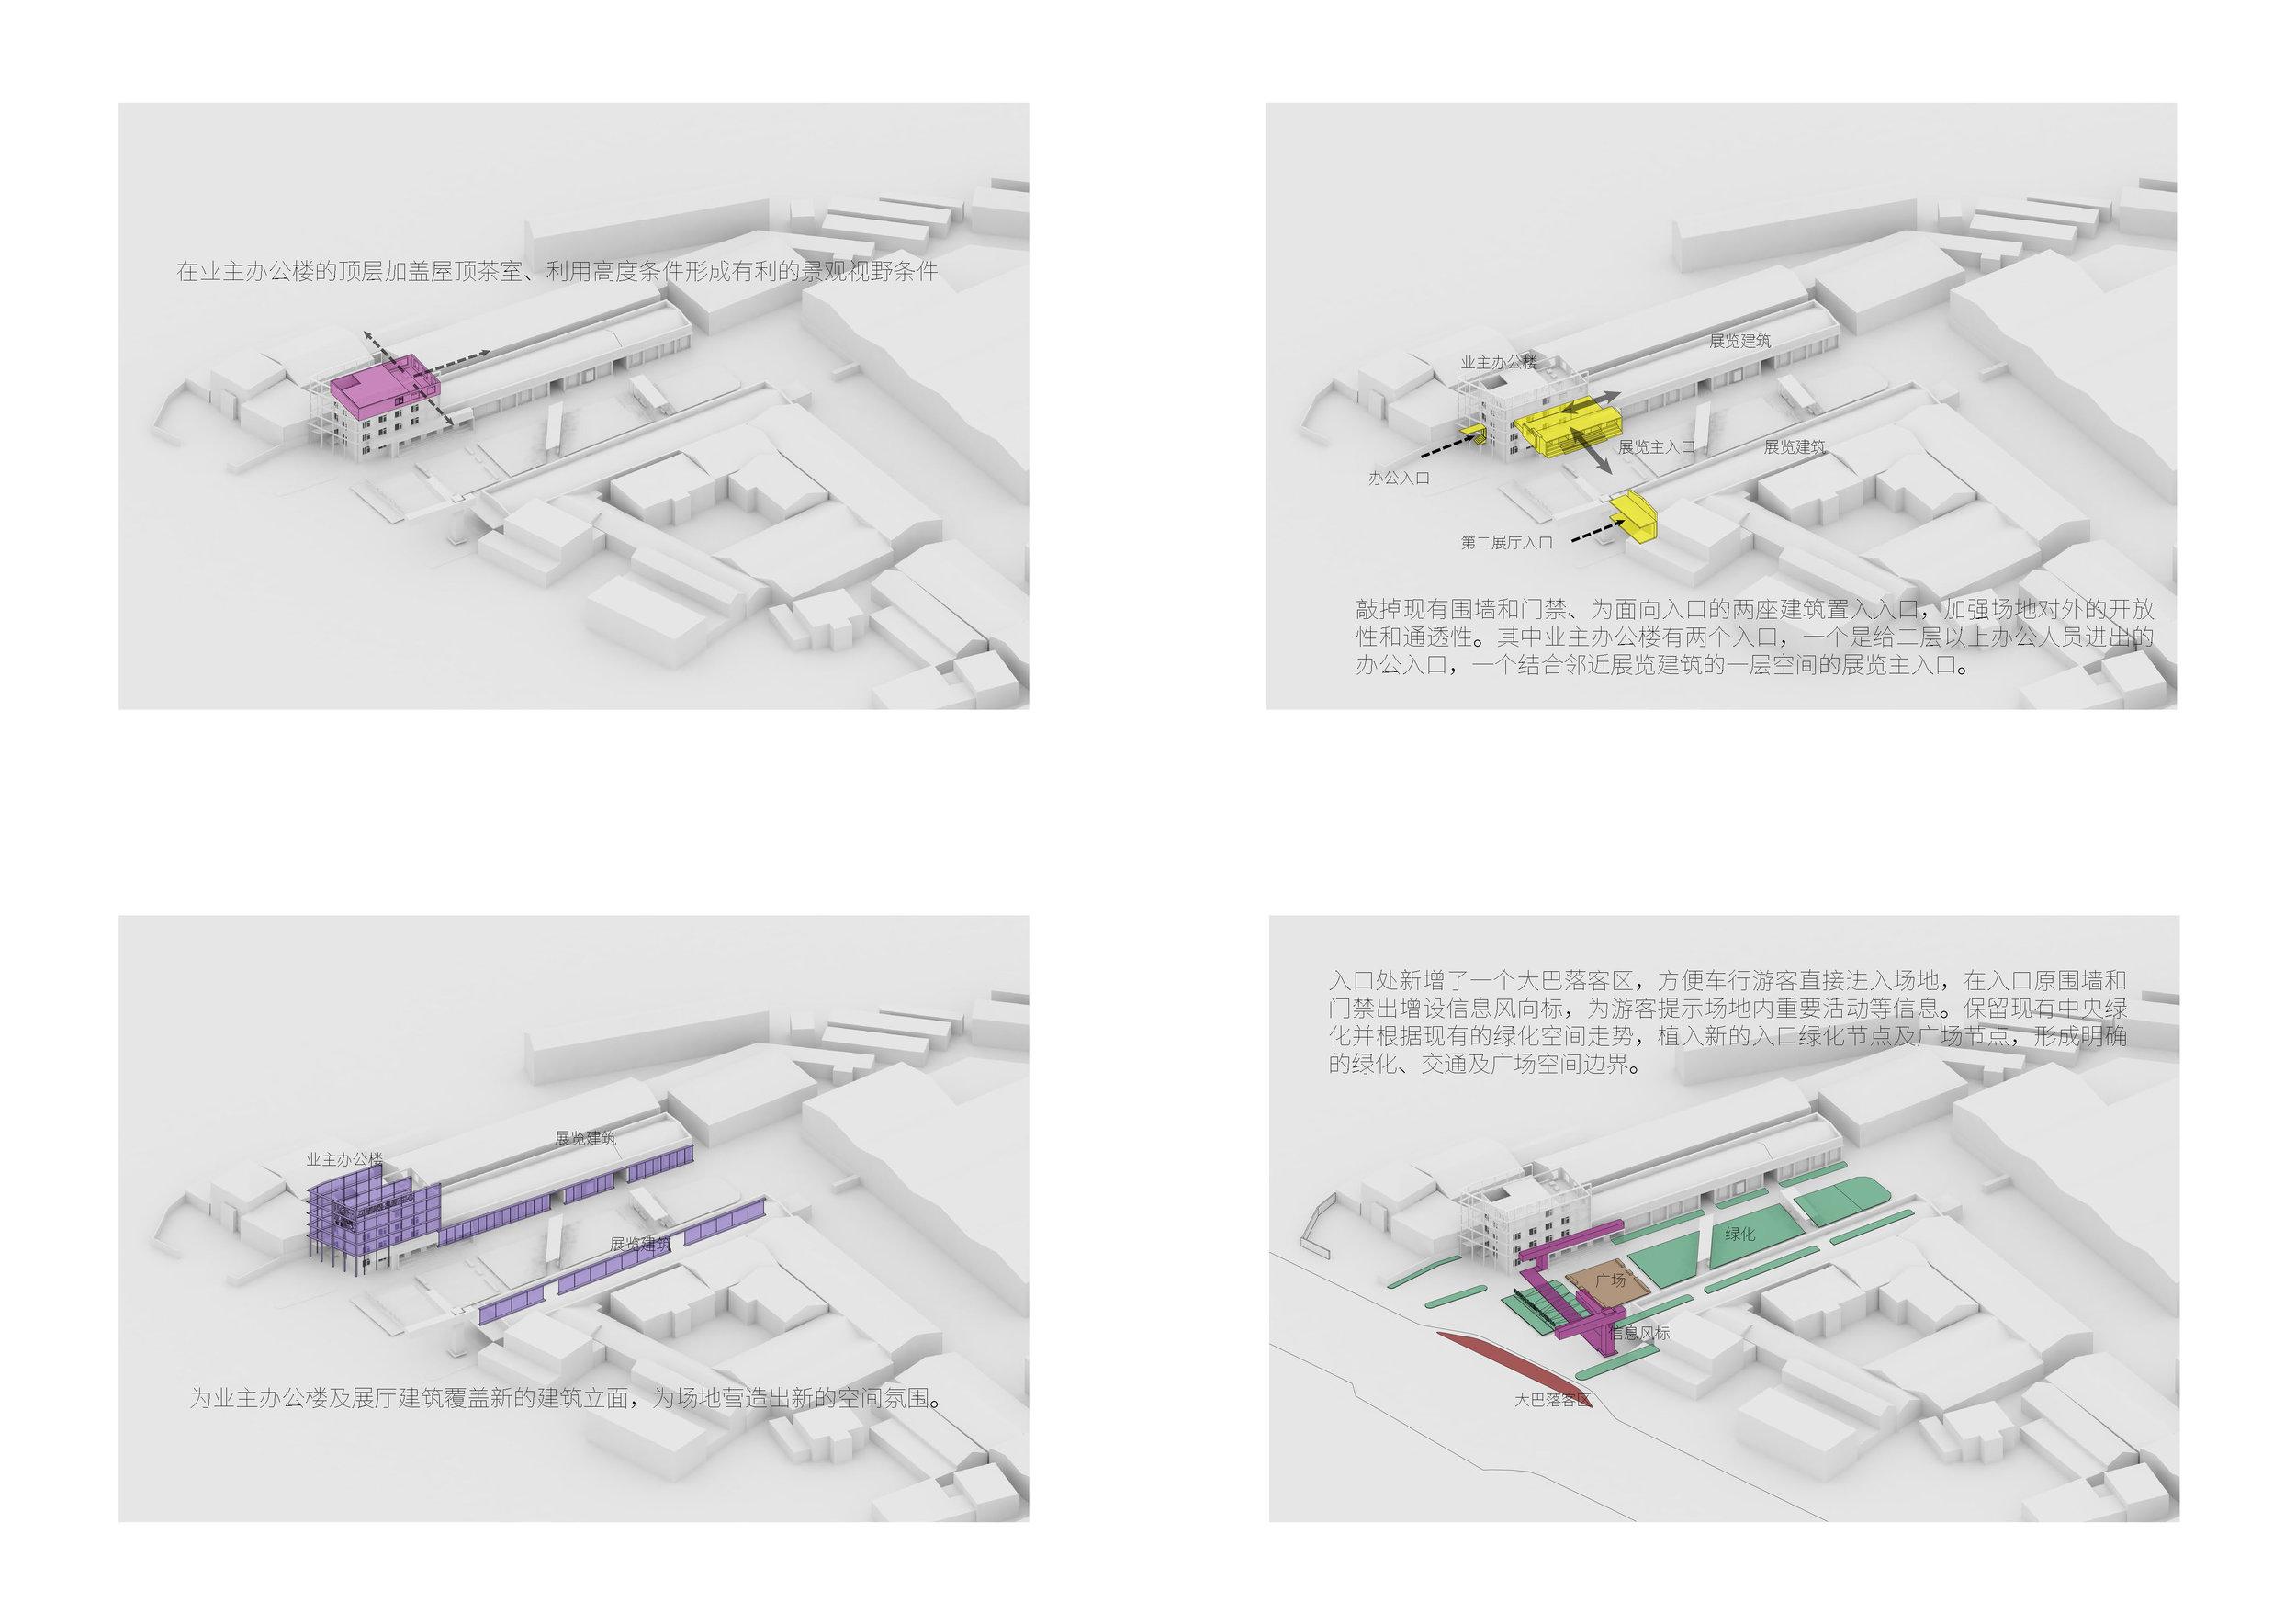 diagram architecture_页面_2.jpg